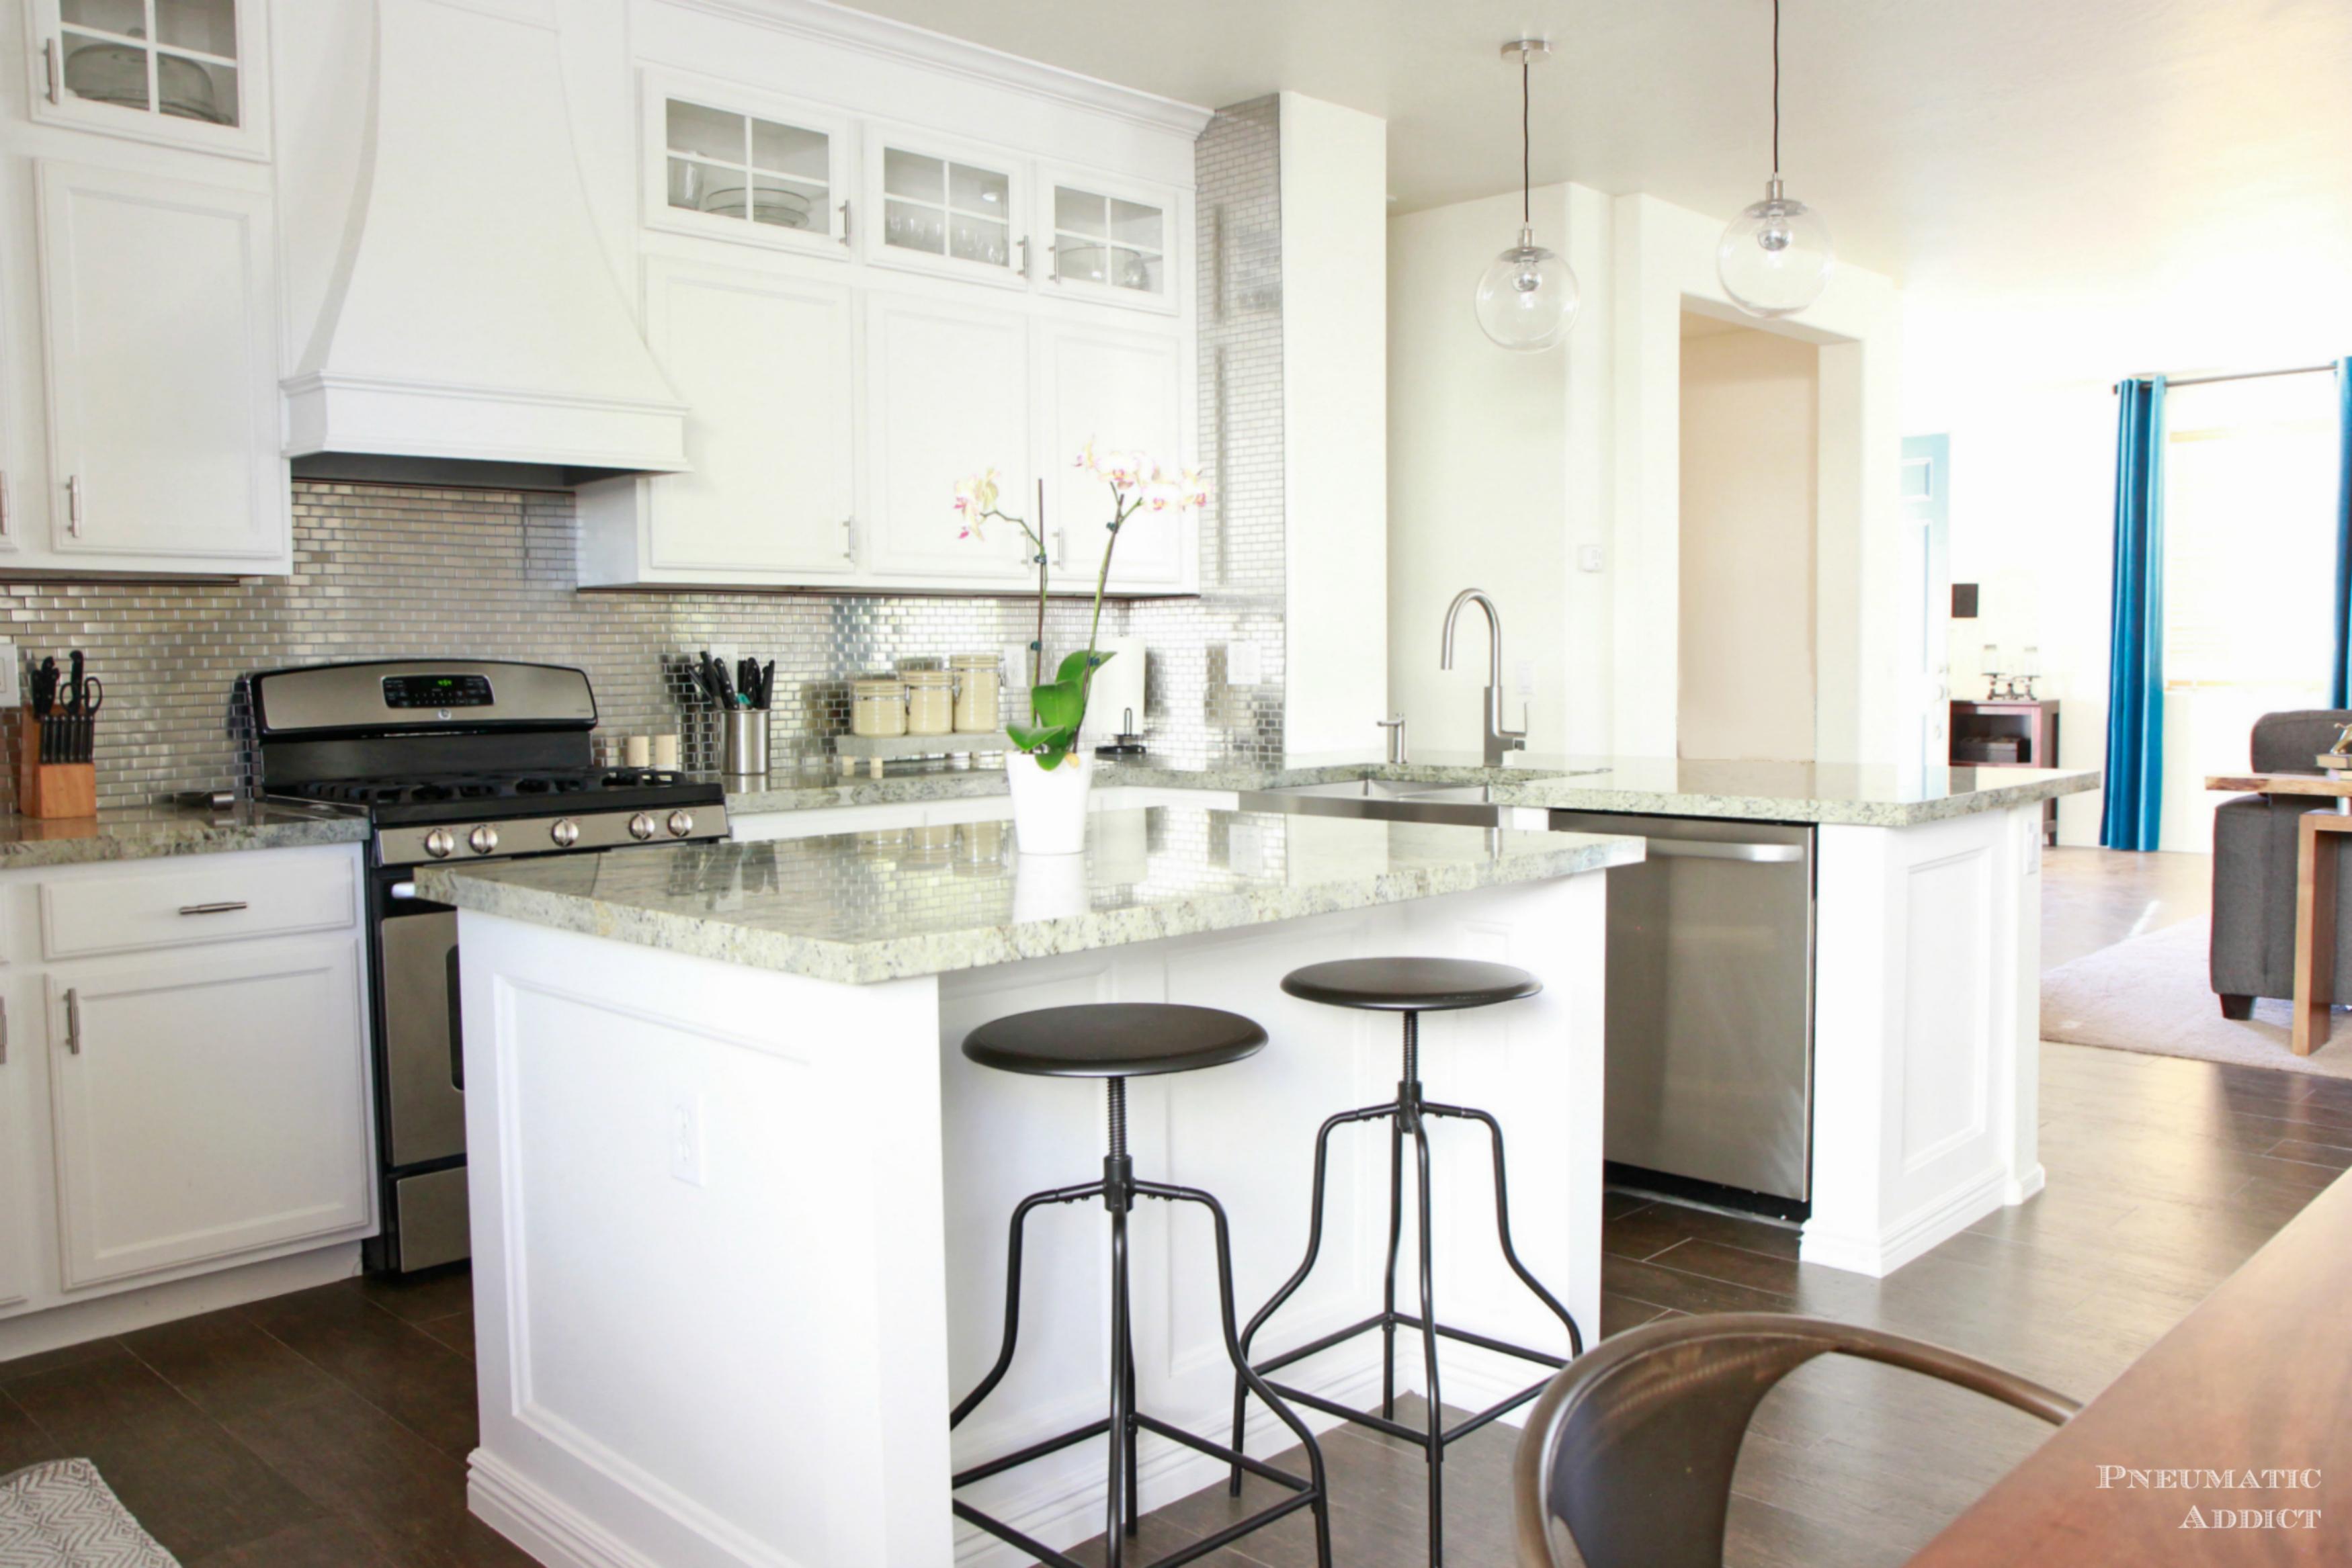 11 best white kitchen cabinets - design ideas for white cabinets MSCWKSG